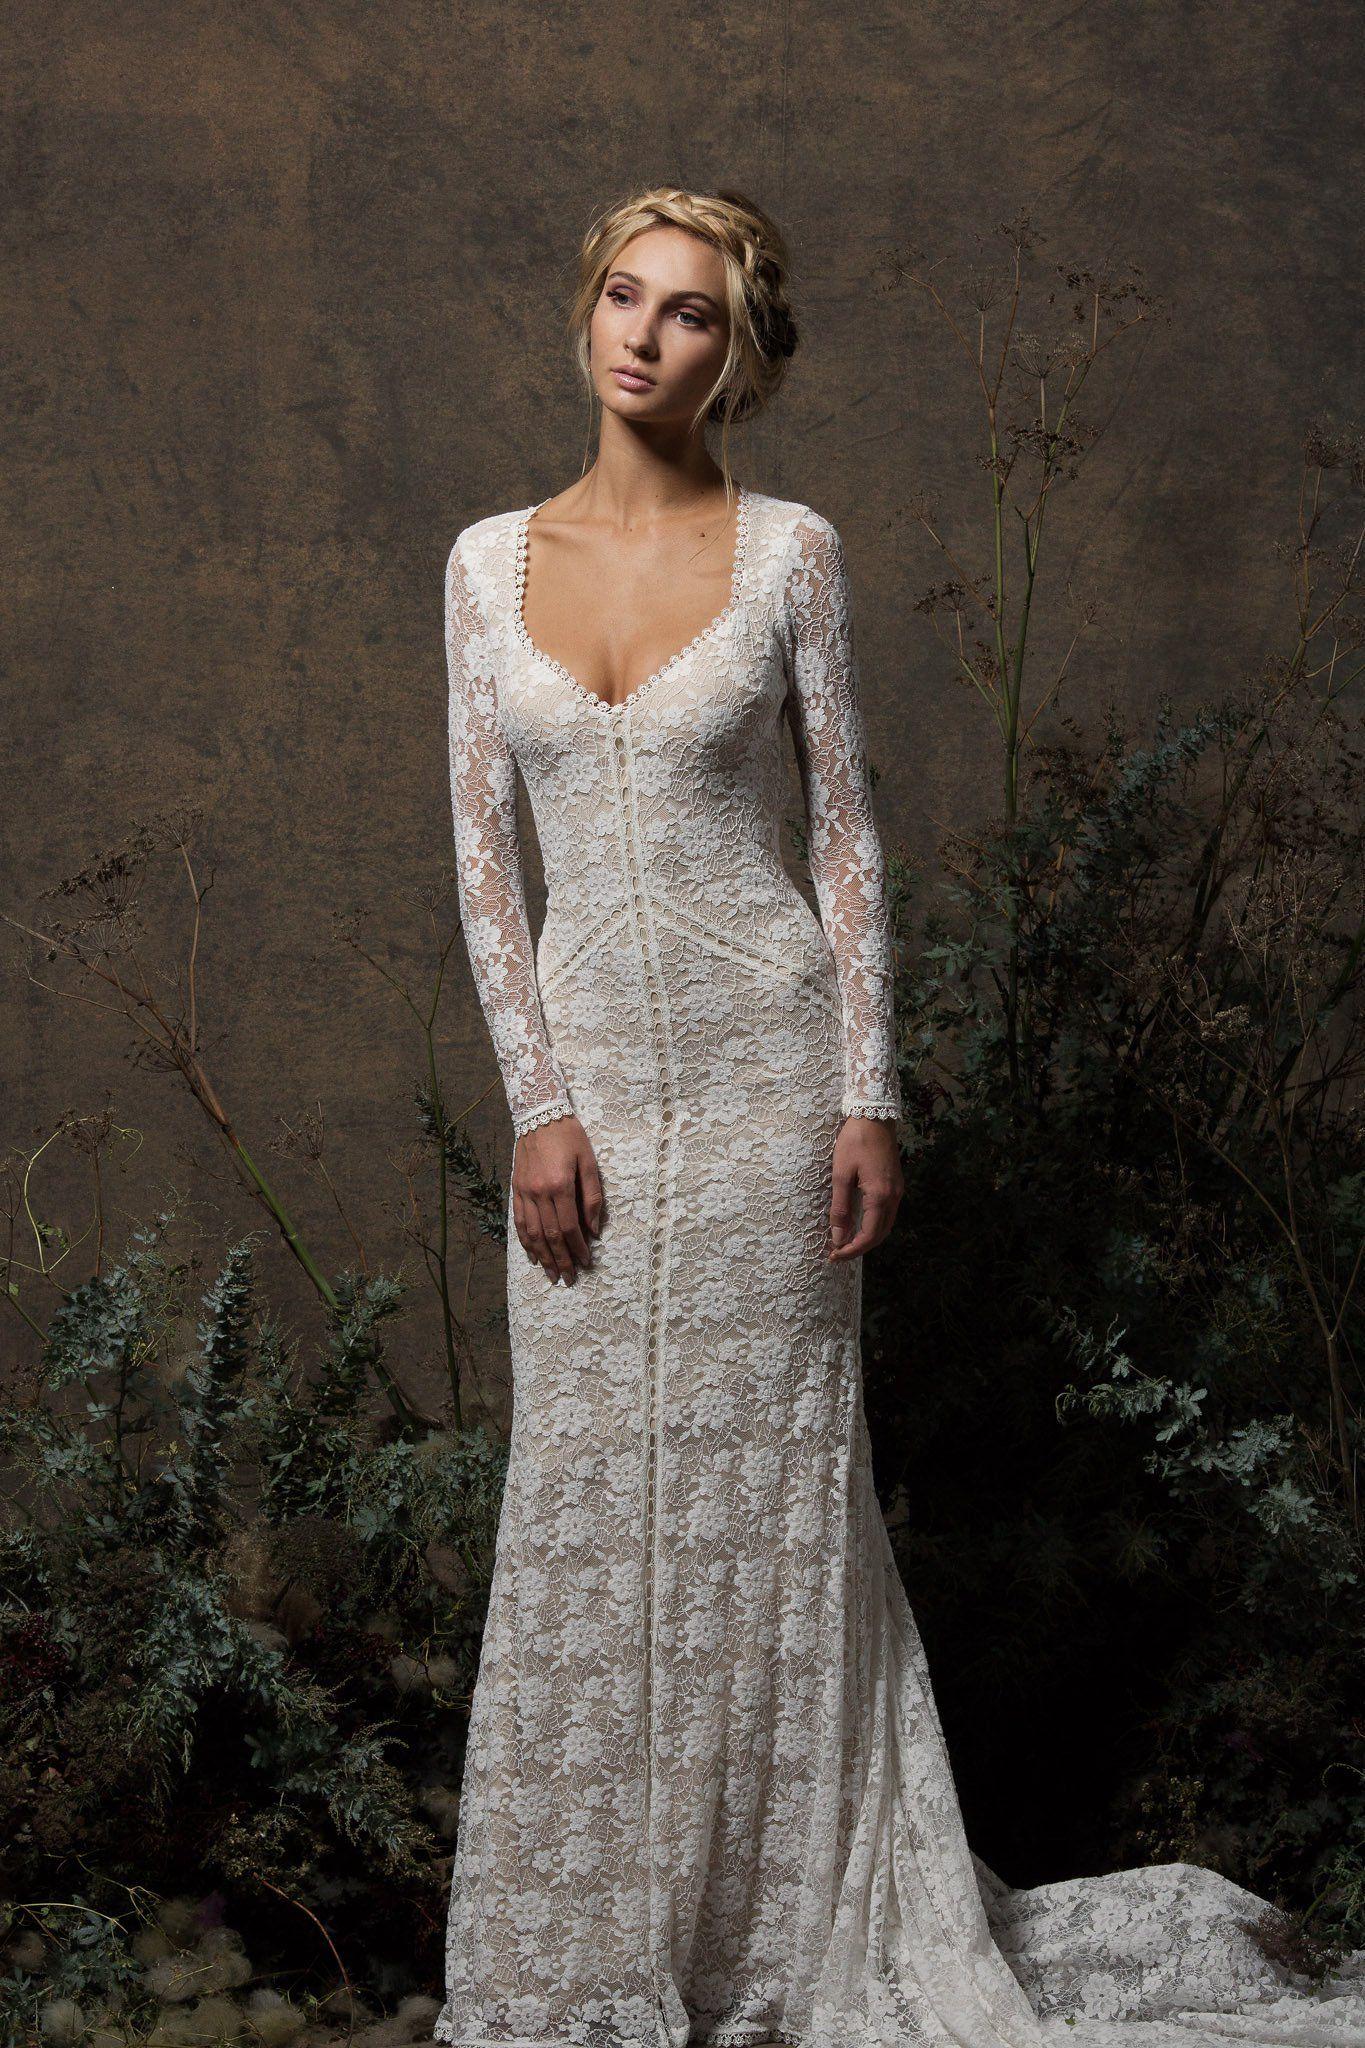 Valentina Backless Lace Wedding Dress Backless Lace Wedding Dress Long Sleeve Wedding Dress Lace Wedding Dresses Lace